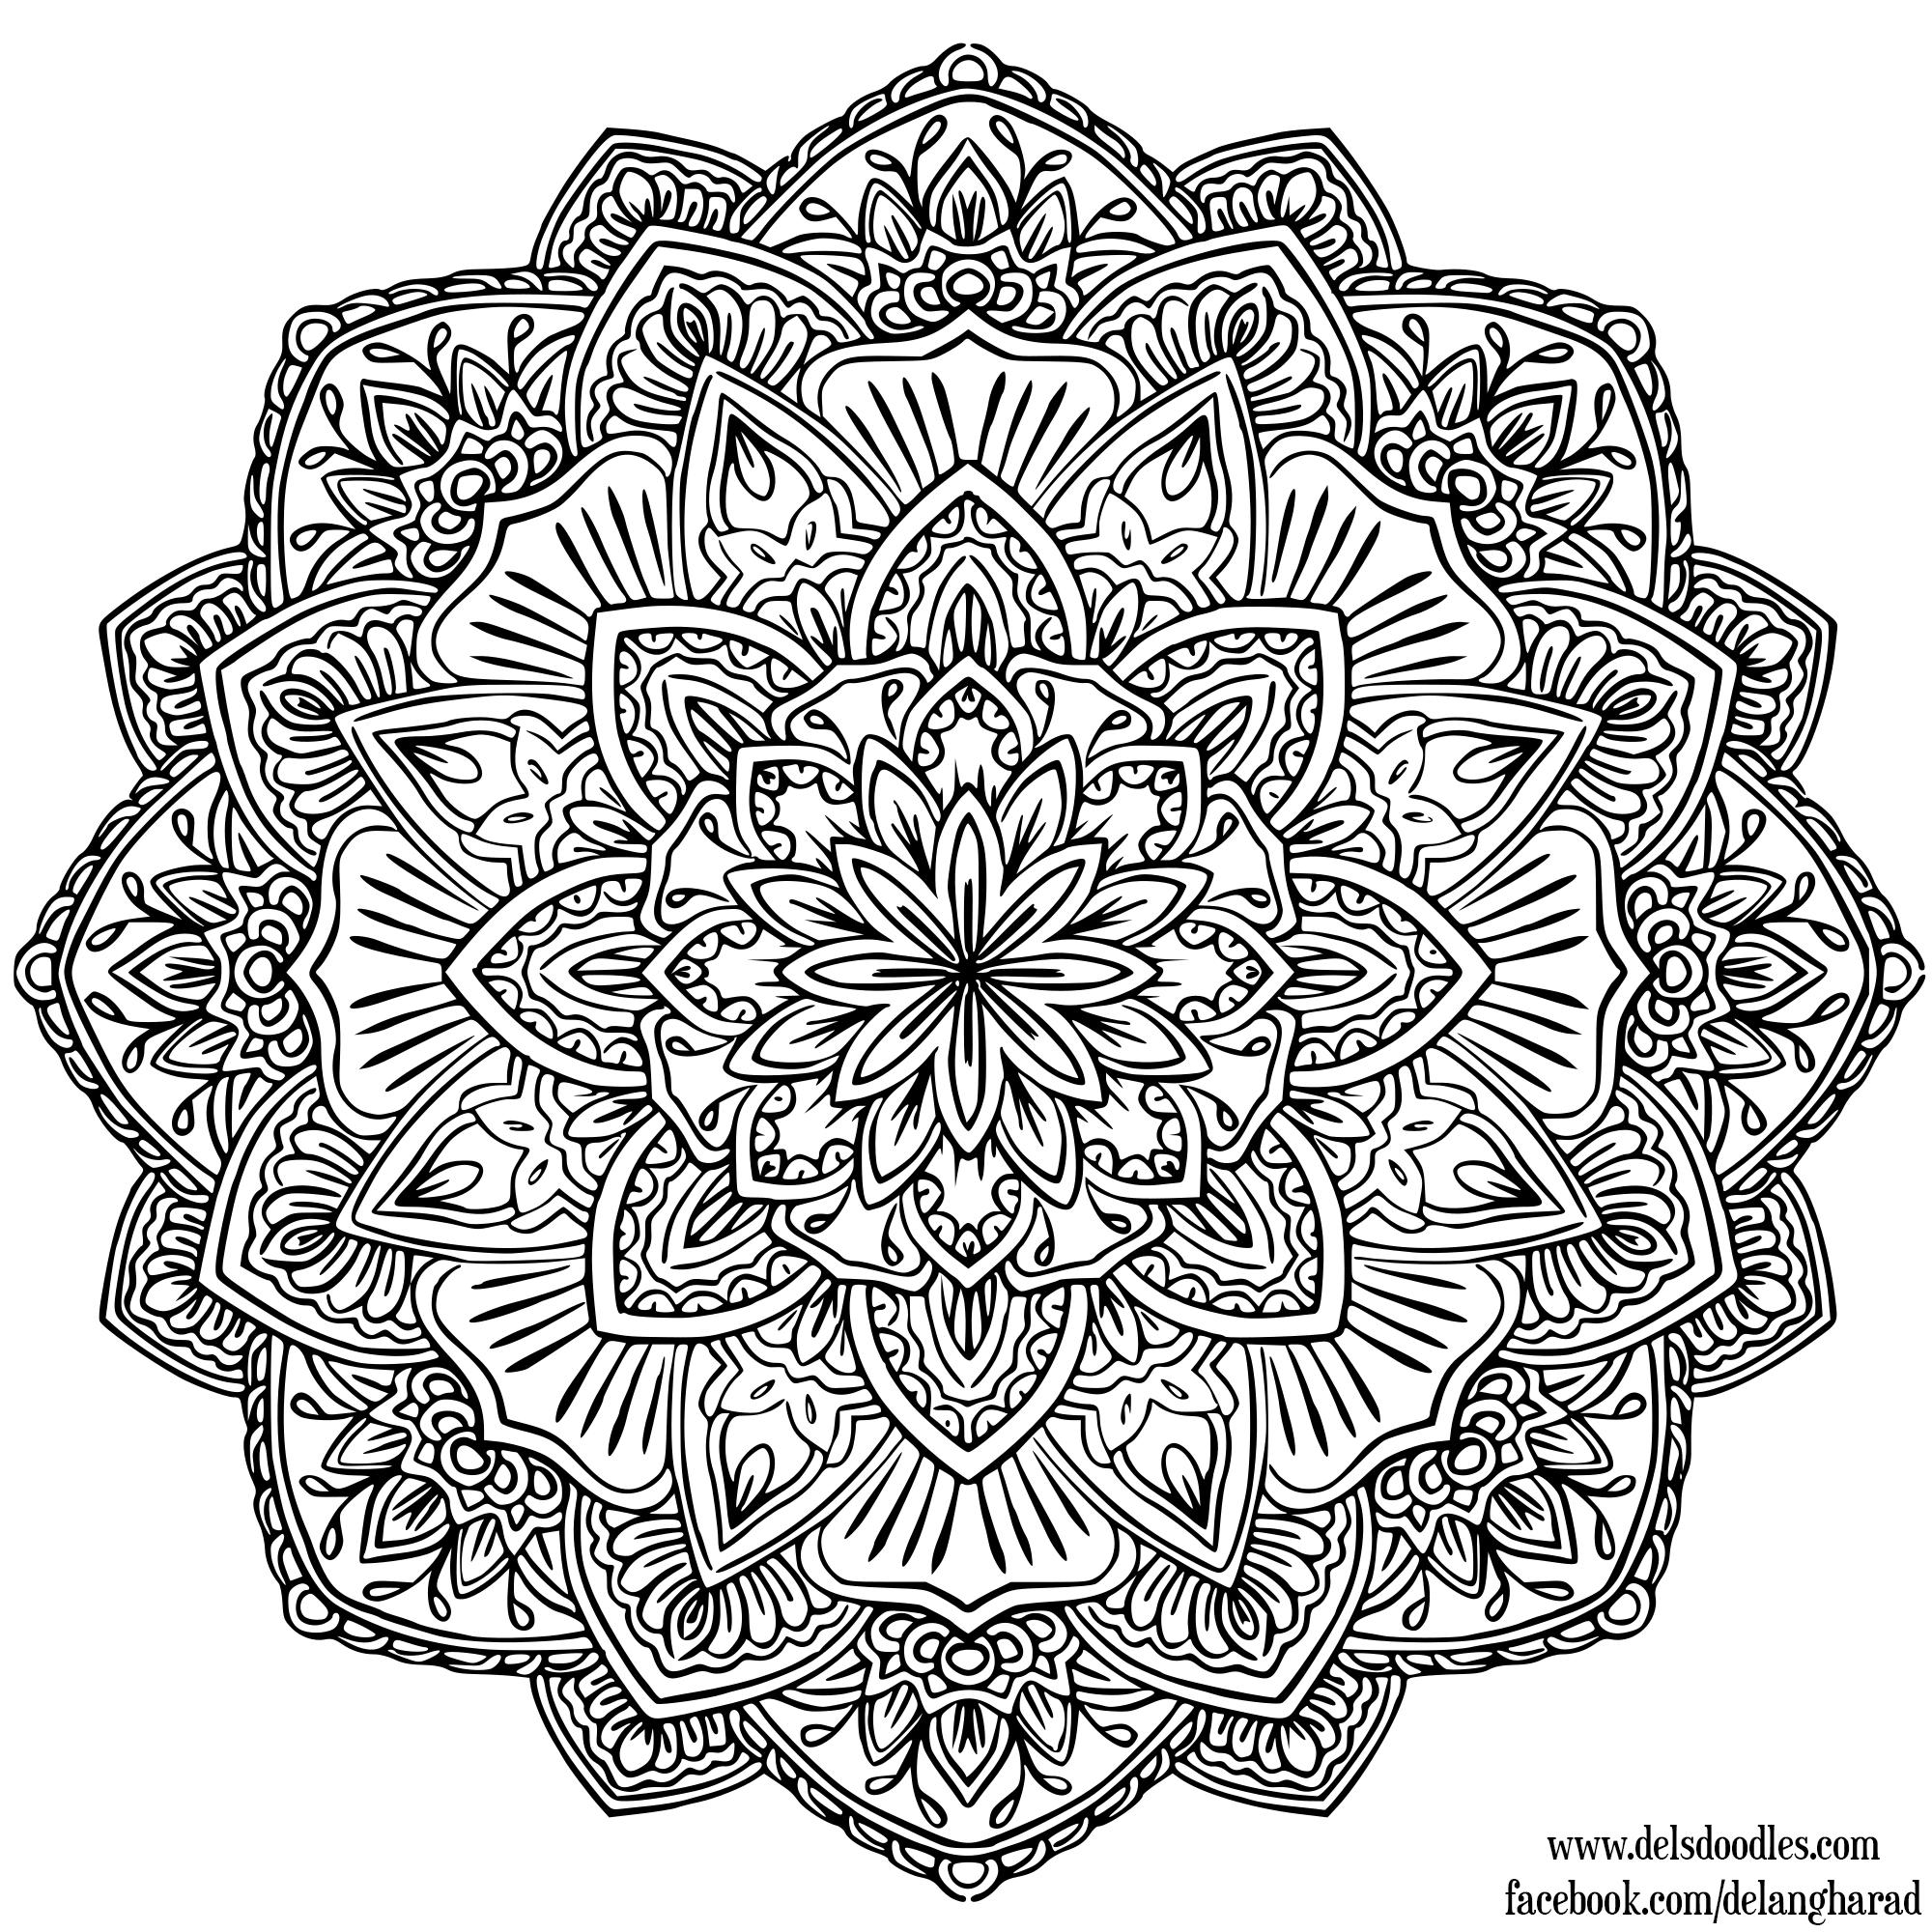 mandala color the meaning and symbolism of the word mandala mandala color